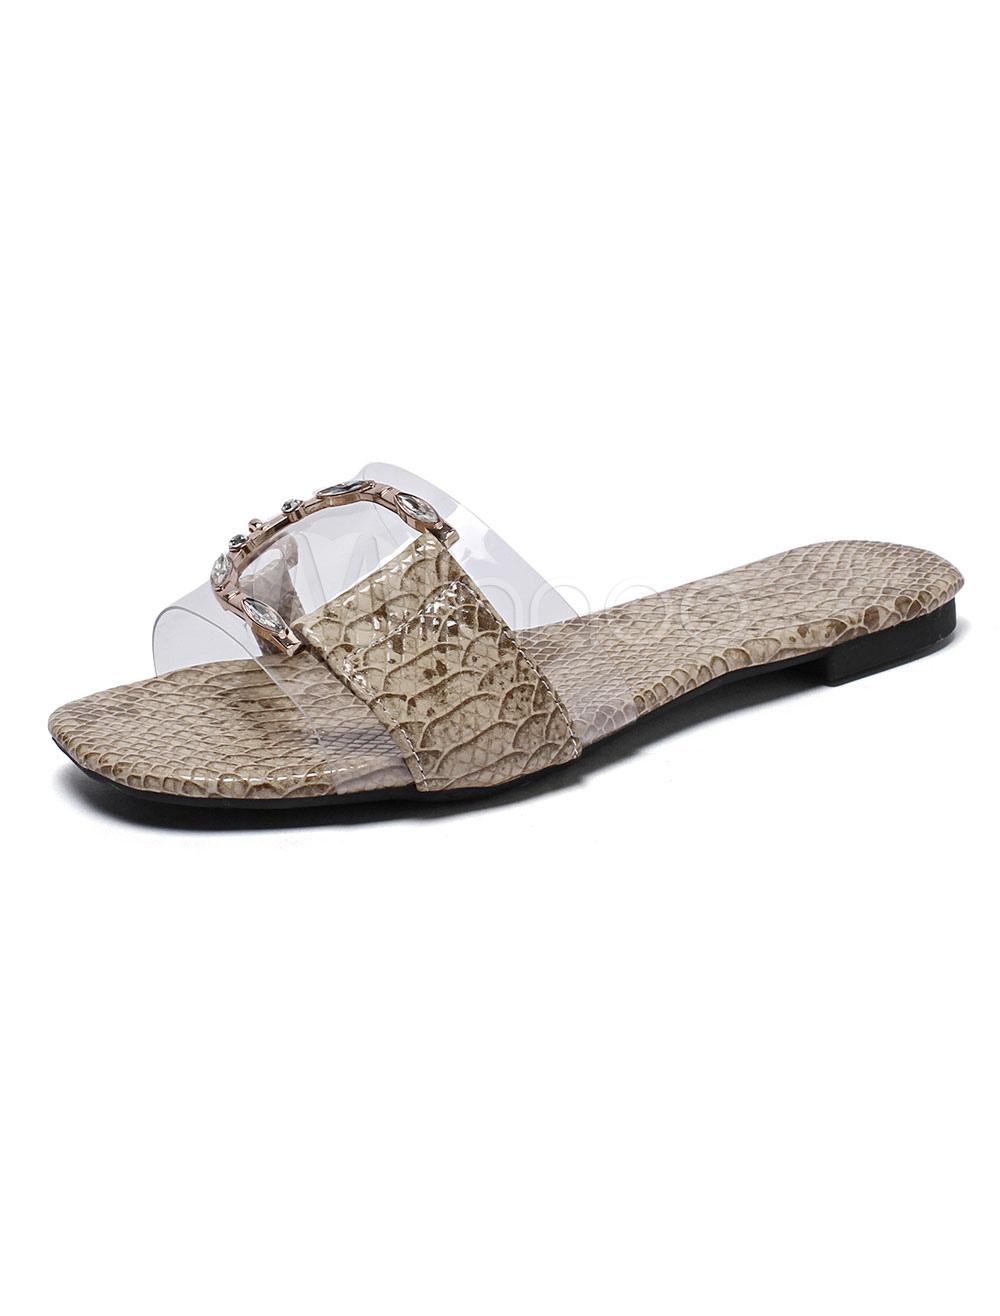 303a857b5c9b Women Sandal Slides Apricot Open Toe Snake Printed Rhinestones Metal ...